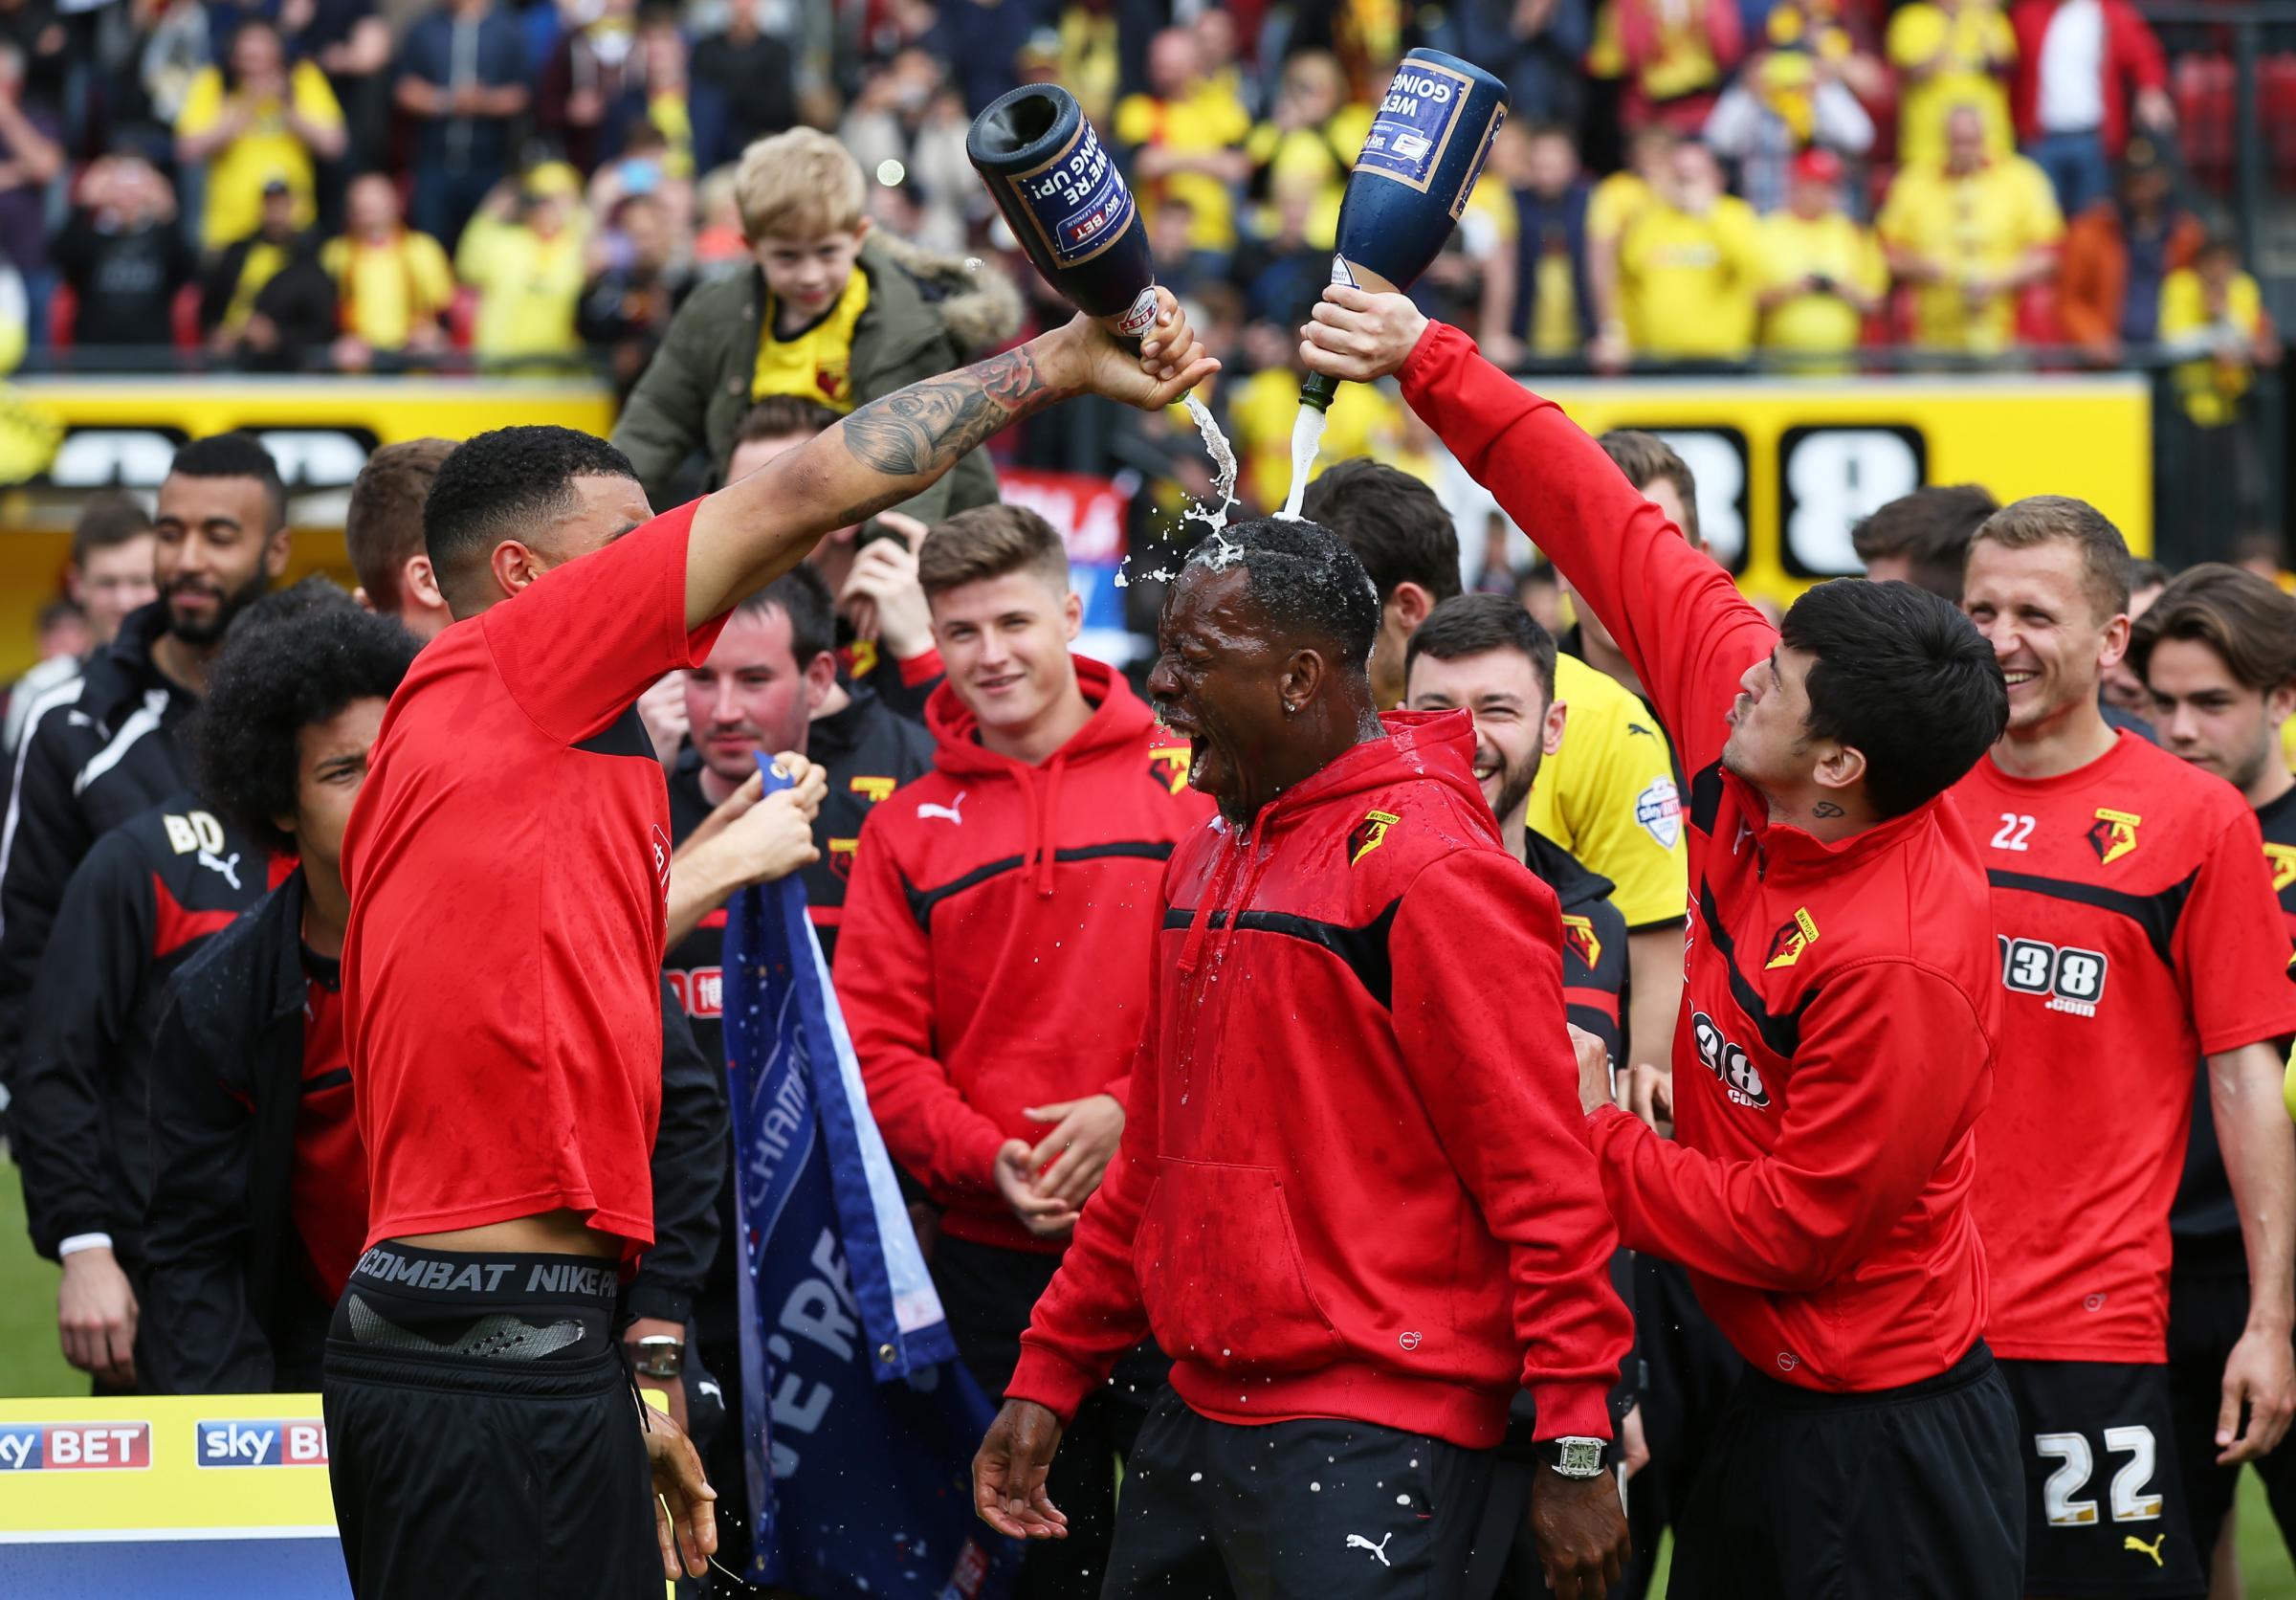 Watford stalwart Lloyd Doyley hoping to return to club in the future